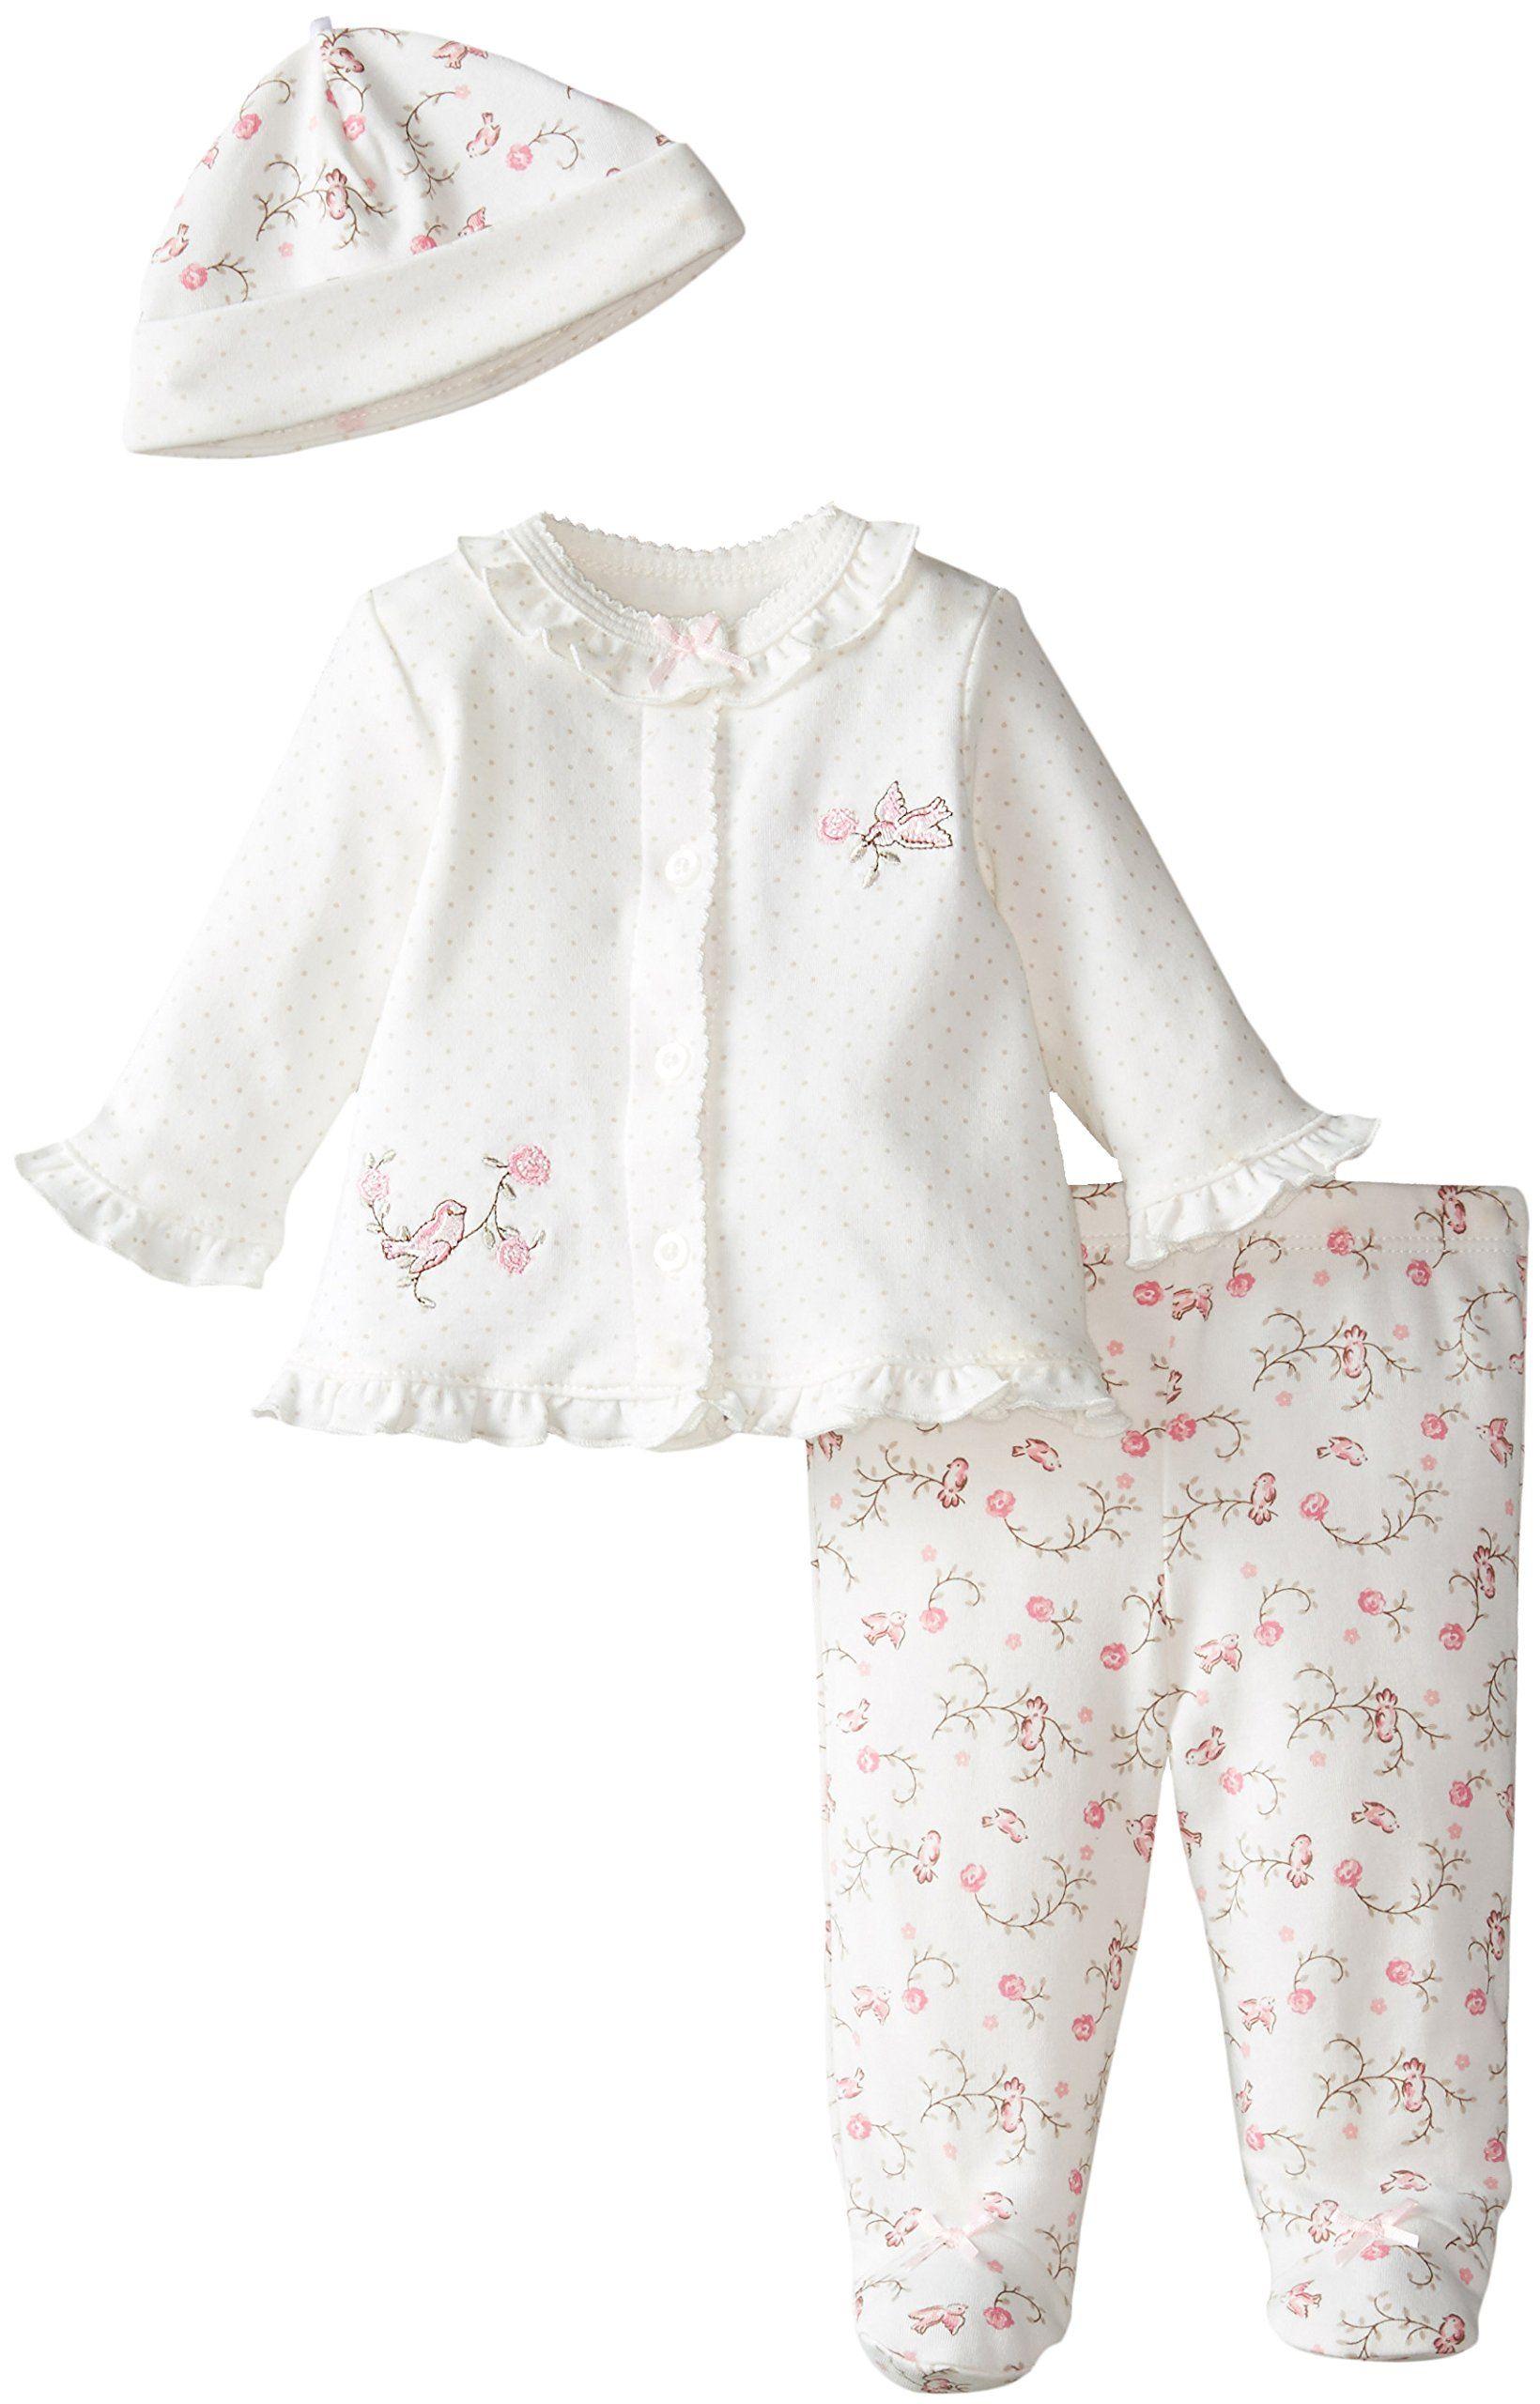 747dfea16 Amazon.com  Little Me Baby-Girls Newborn Lovebirds Take Me Home Set ...